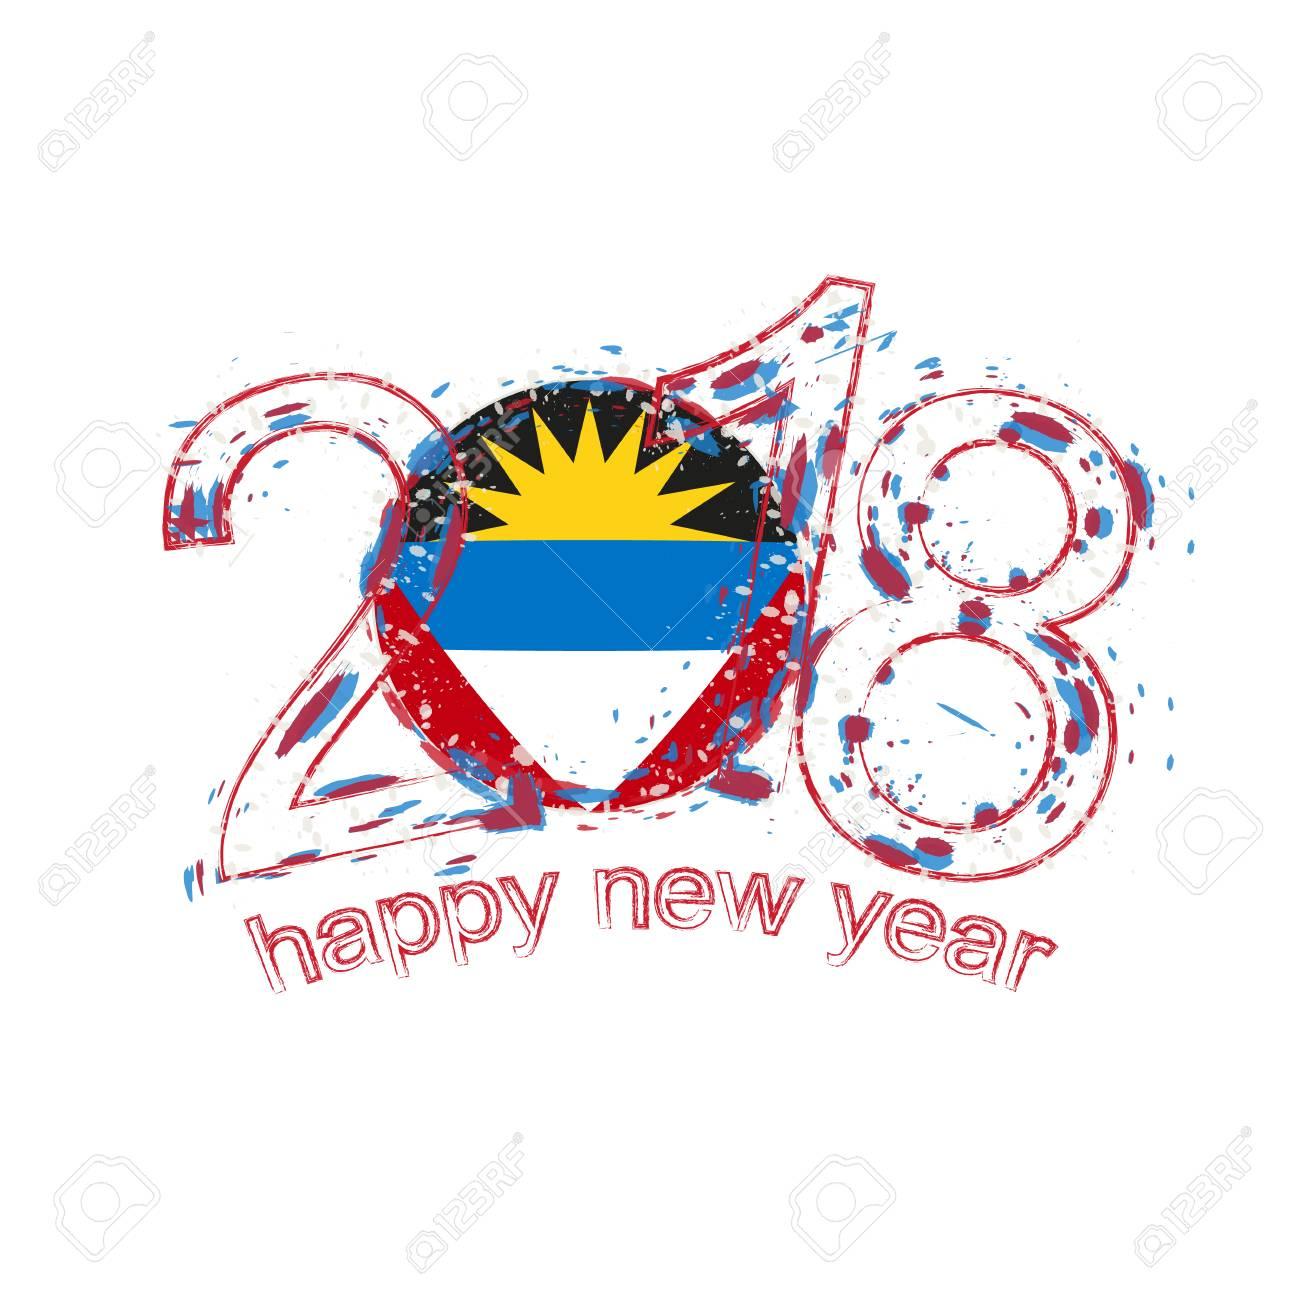 2018 happy new year antigua and barbuda grunge vector template 2018 happy new year antigua and barbuda grunge vector template for greeting card calendars 2018 kristyandbryce Images